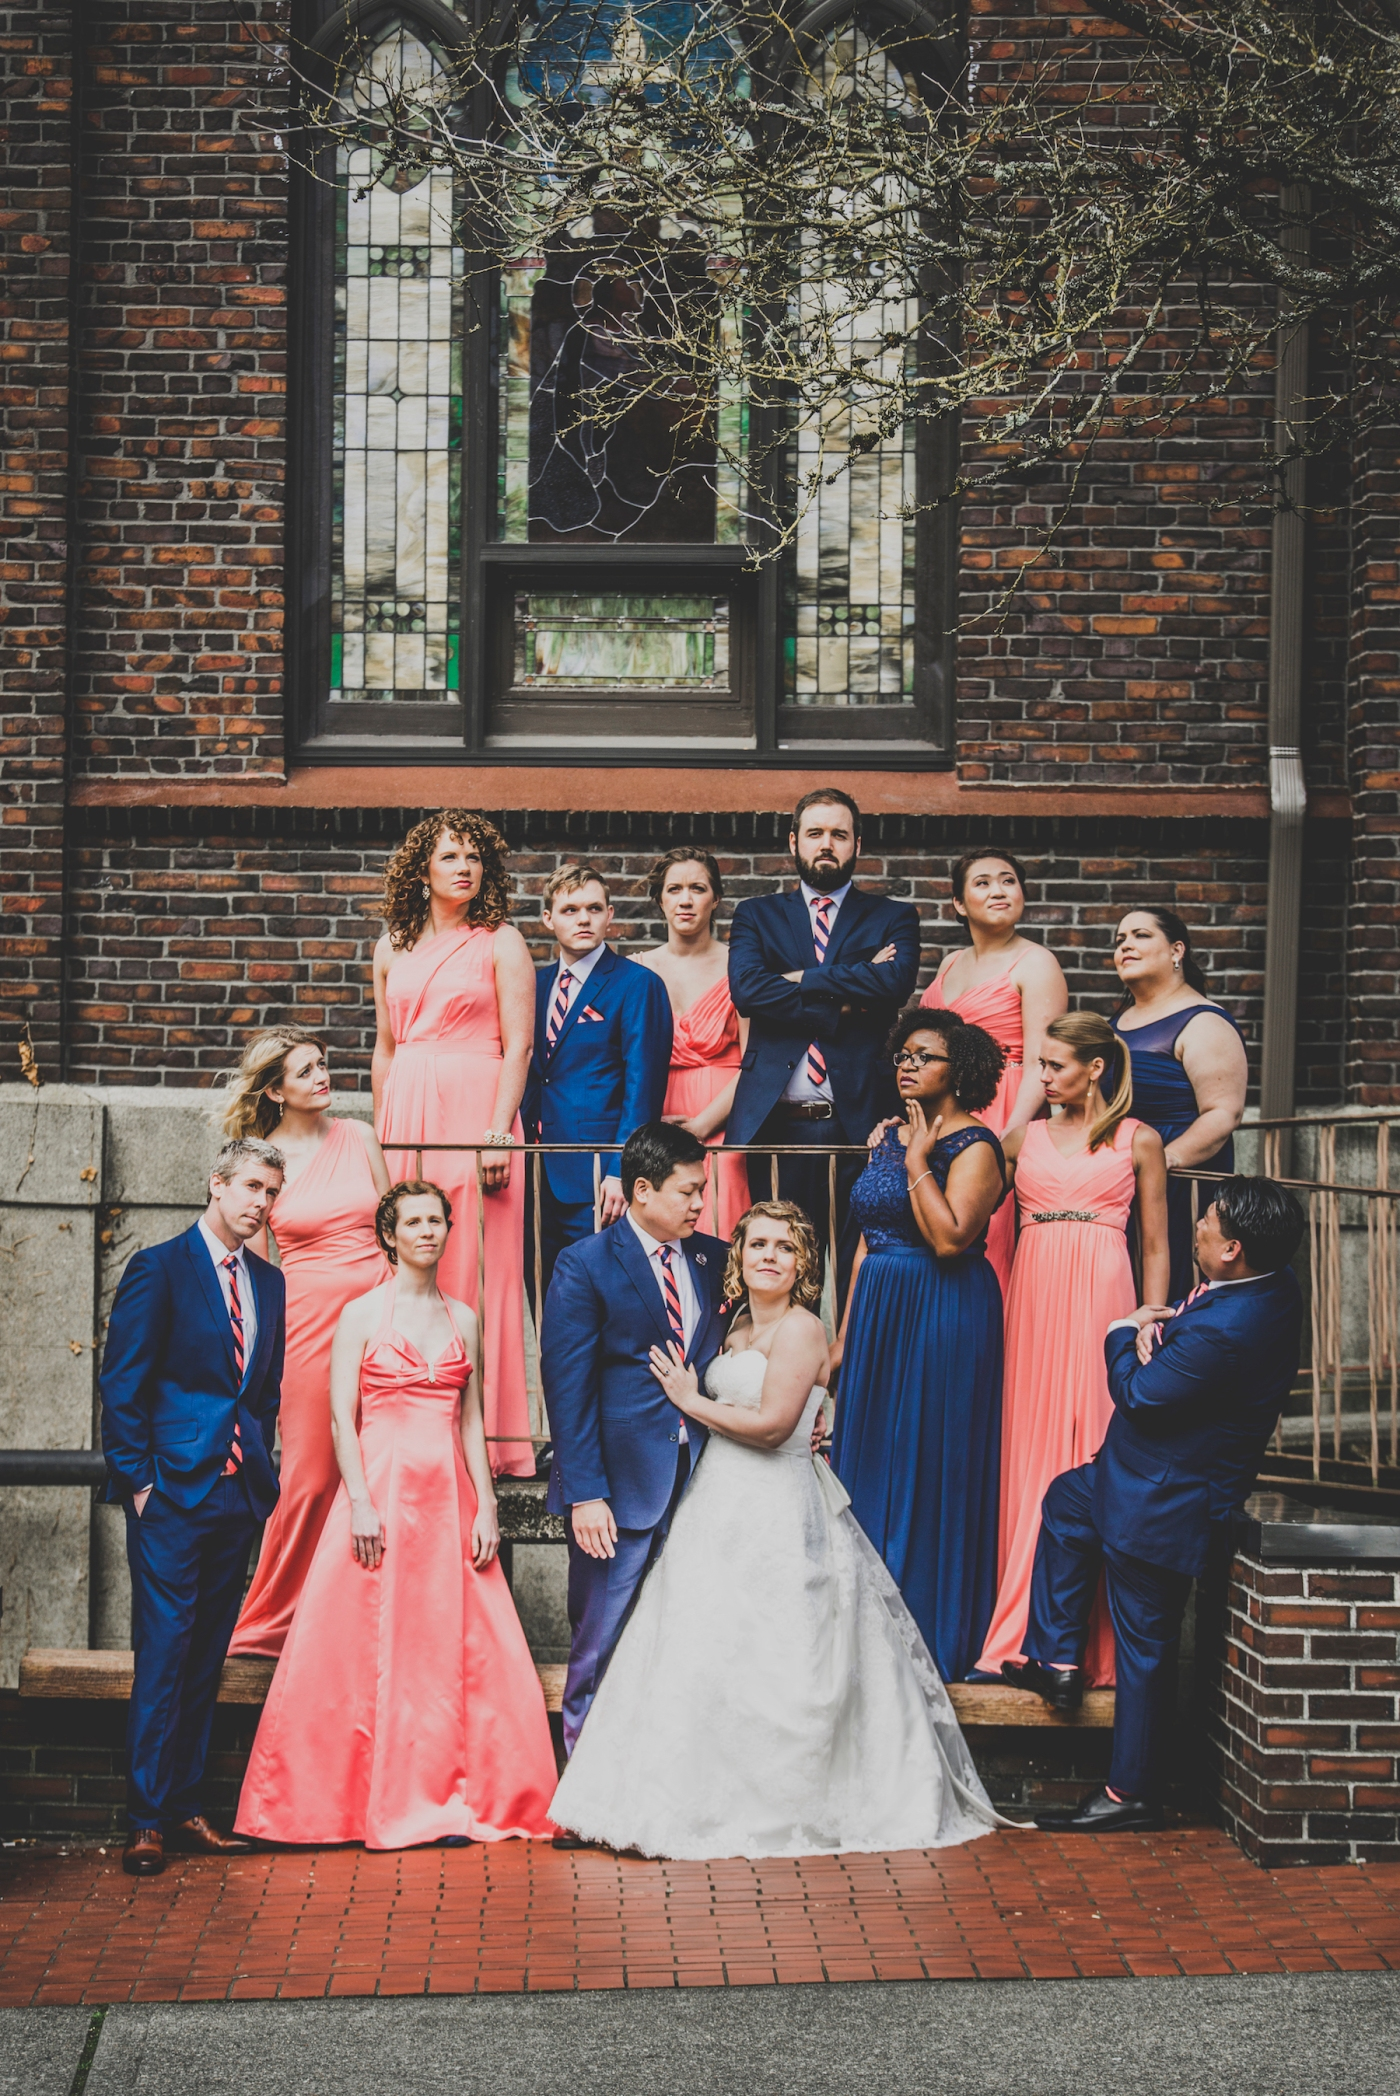 DSC_2200Everett_Wedding_Ballroom_Jane_Speleers_photography_Rachel_and_Edmund_Bridesmaids_peach_dresses_groomsmen_2017